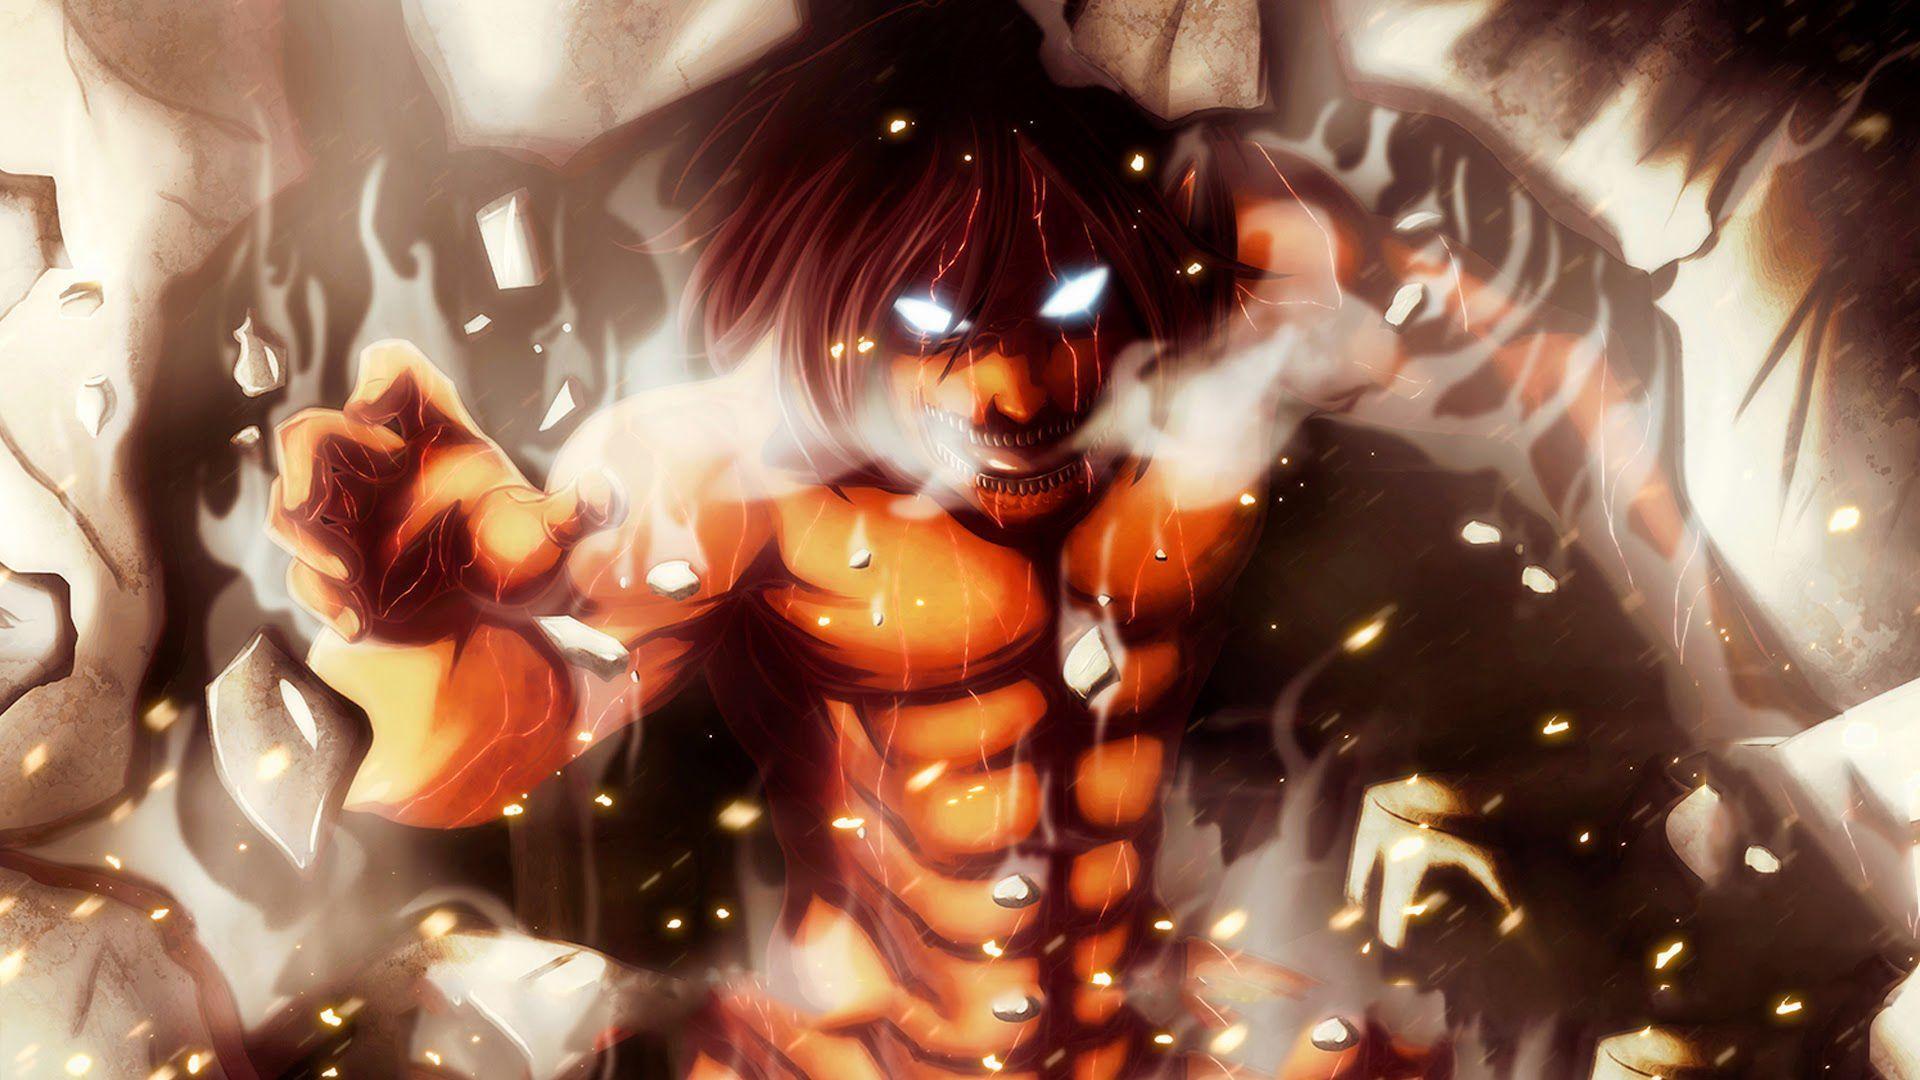 Attack On Titan Eren Wallpapers Top Free Attack On Titan Eren Backgrounds Wallpaperaccess